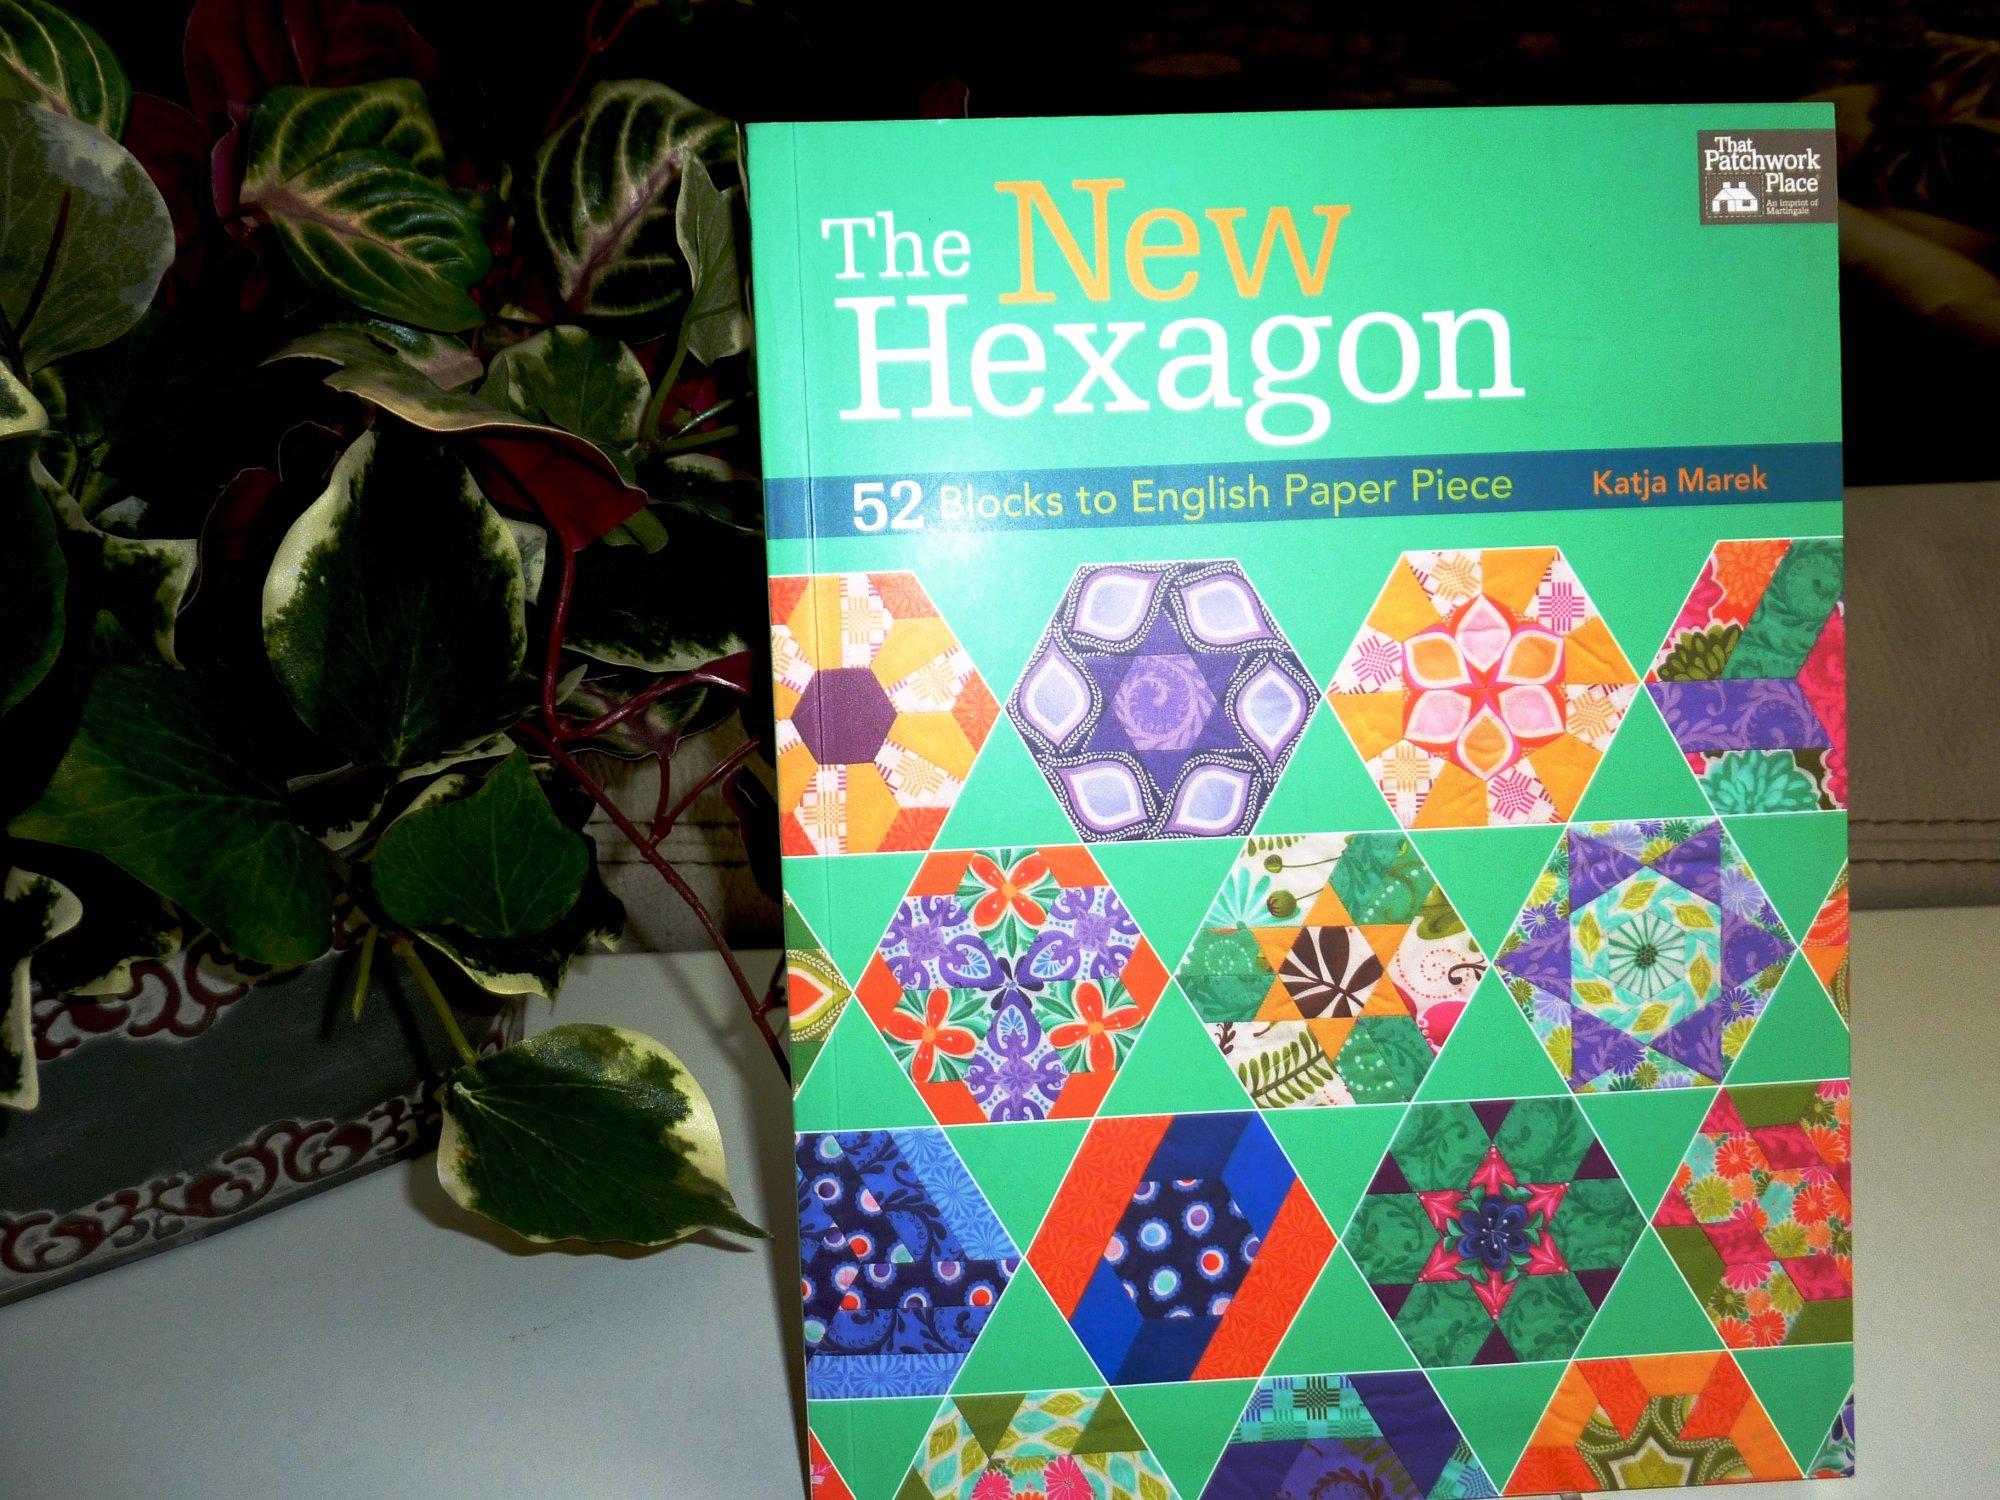 The New Hexagon, 52 Blocks to English Paper Piece by Katja Merek